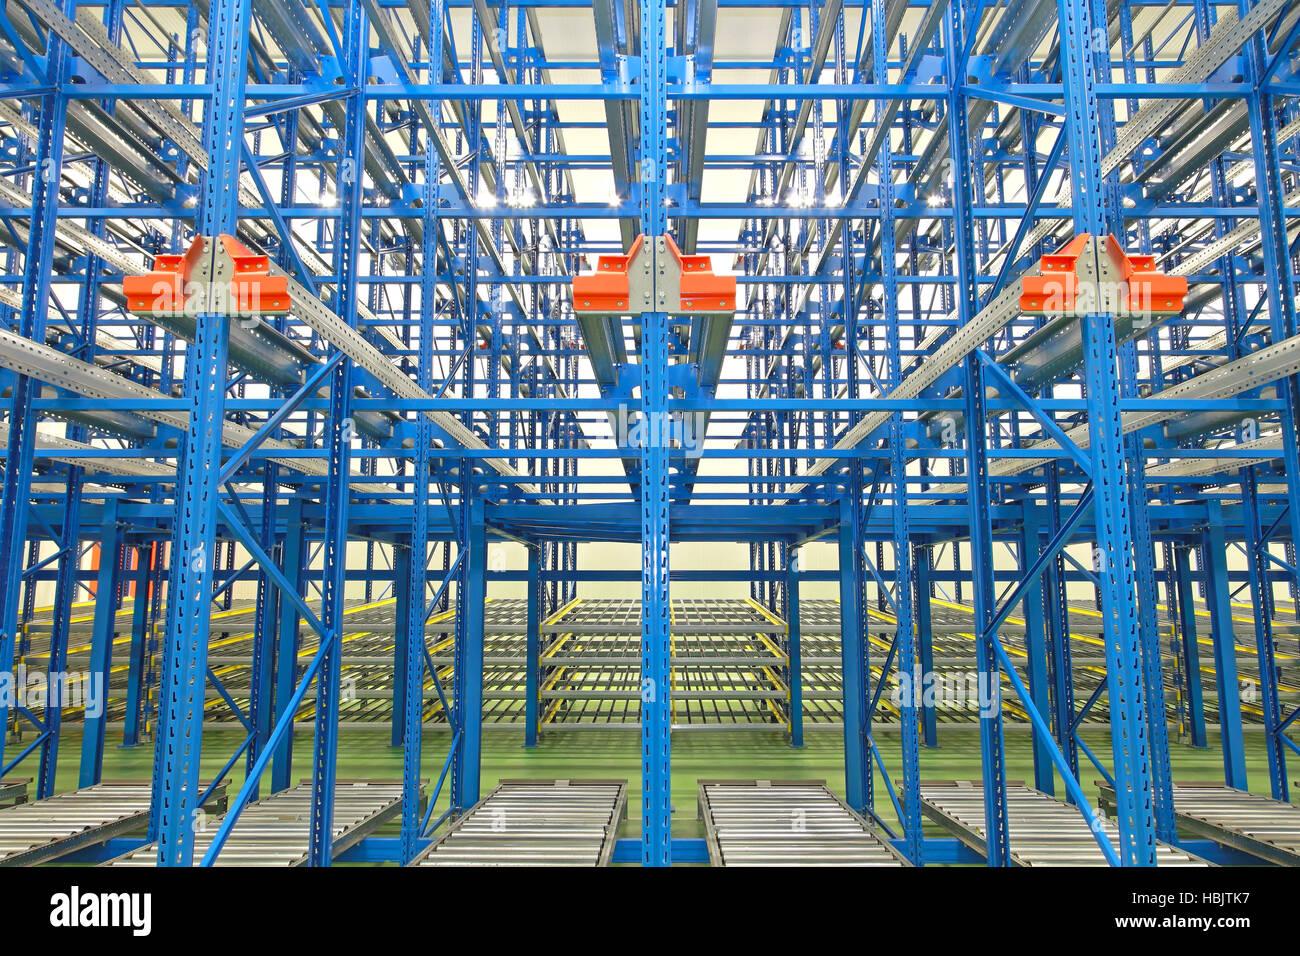 Gravity Storage Shelves - Stock Image